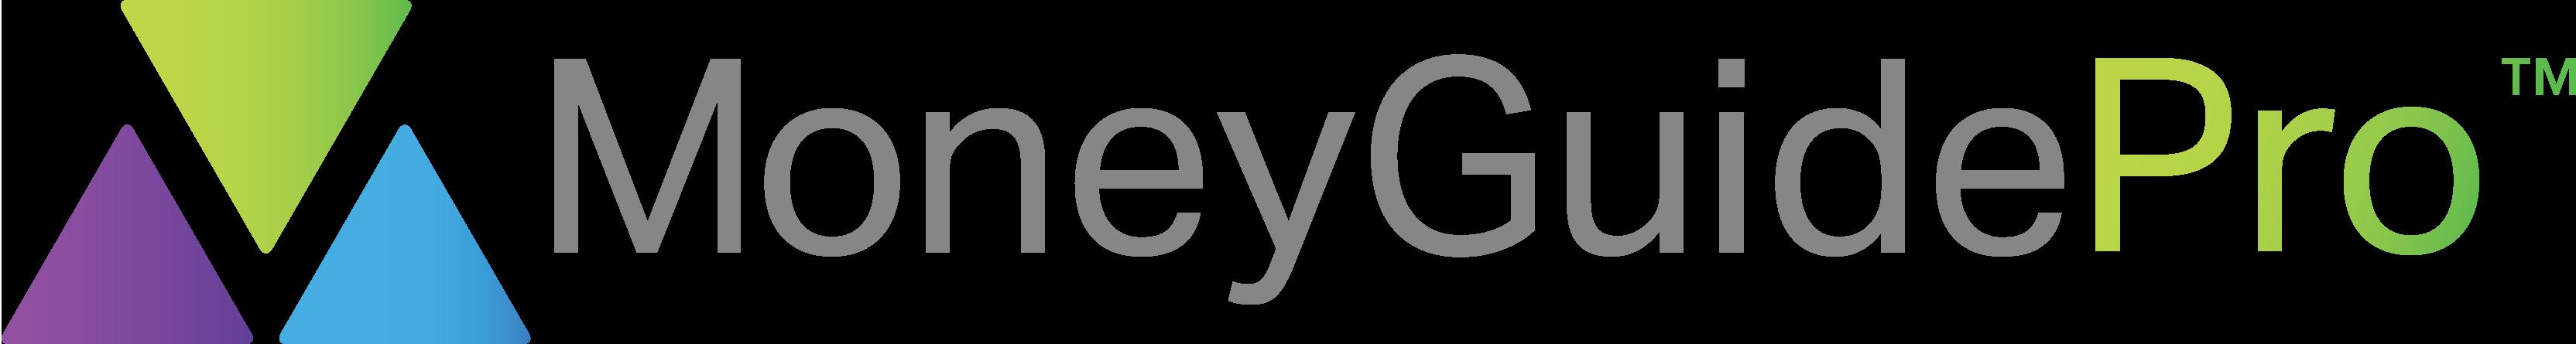 money-guide-pro-logo